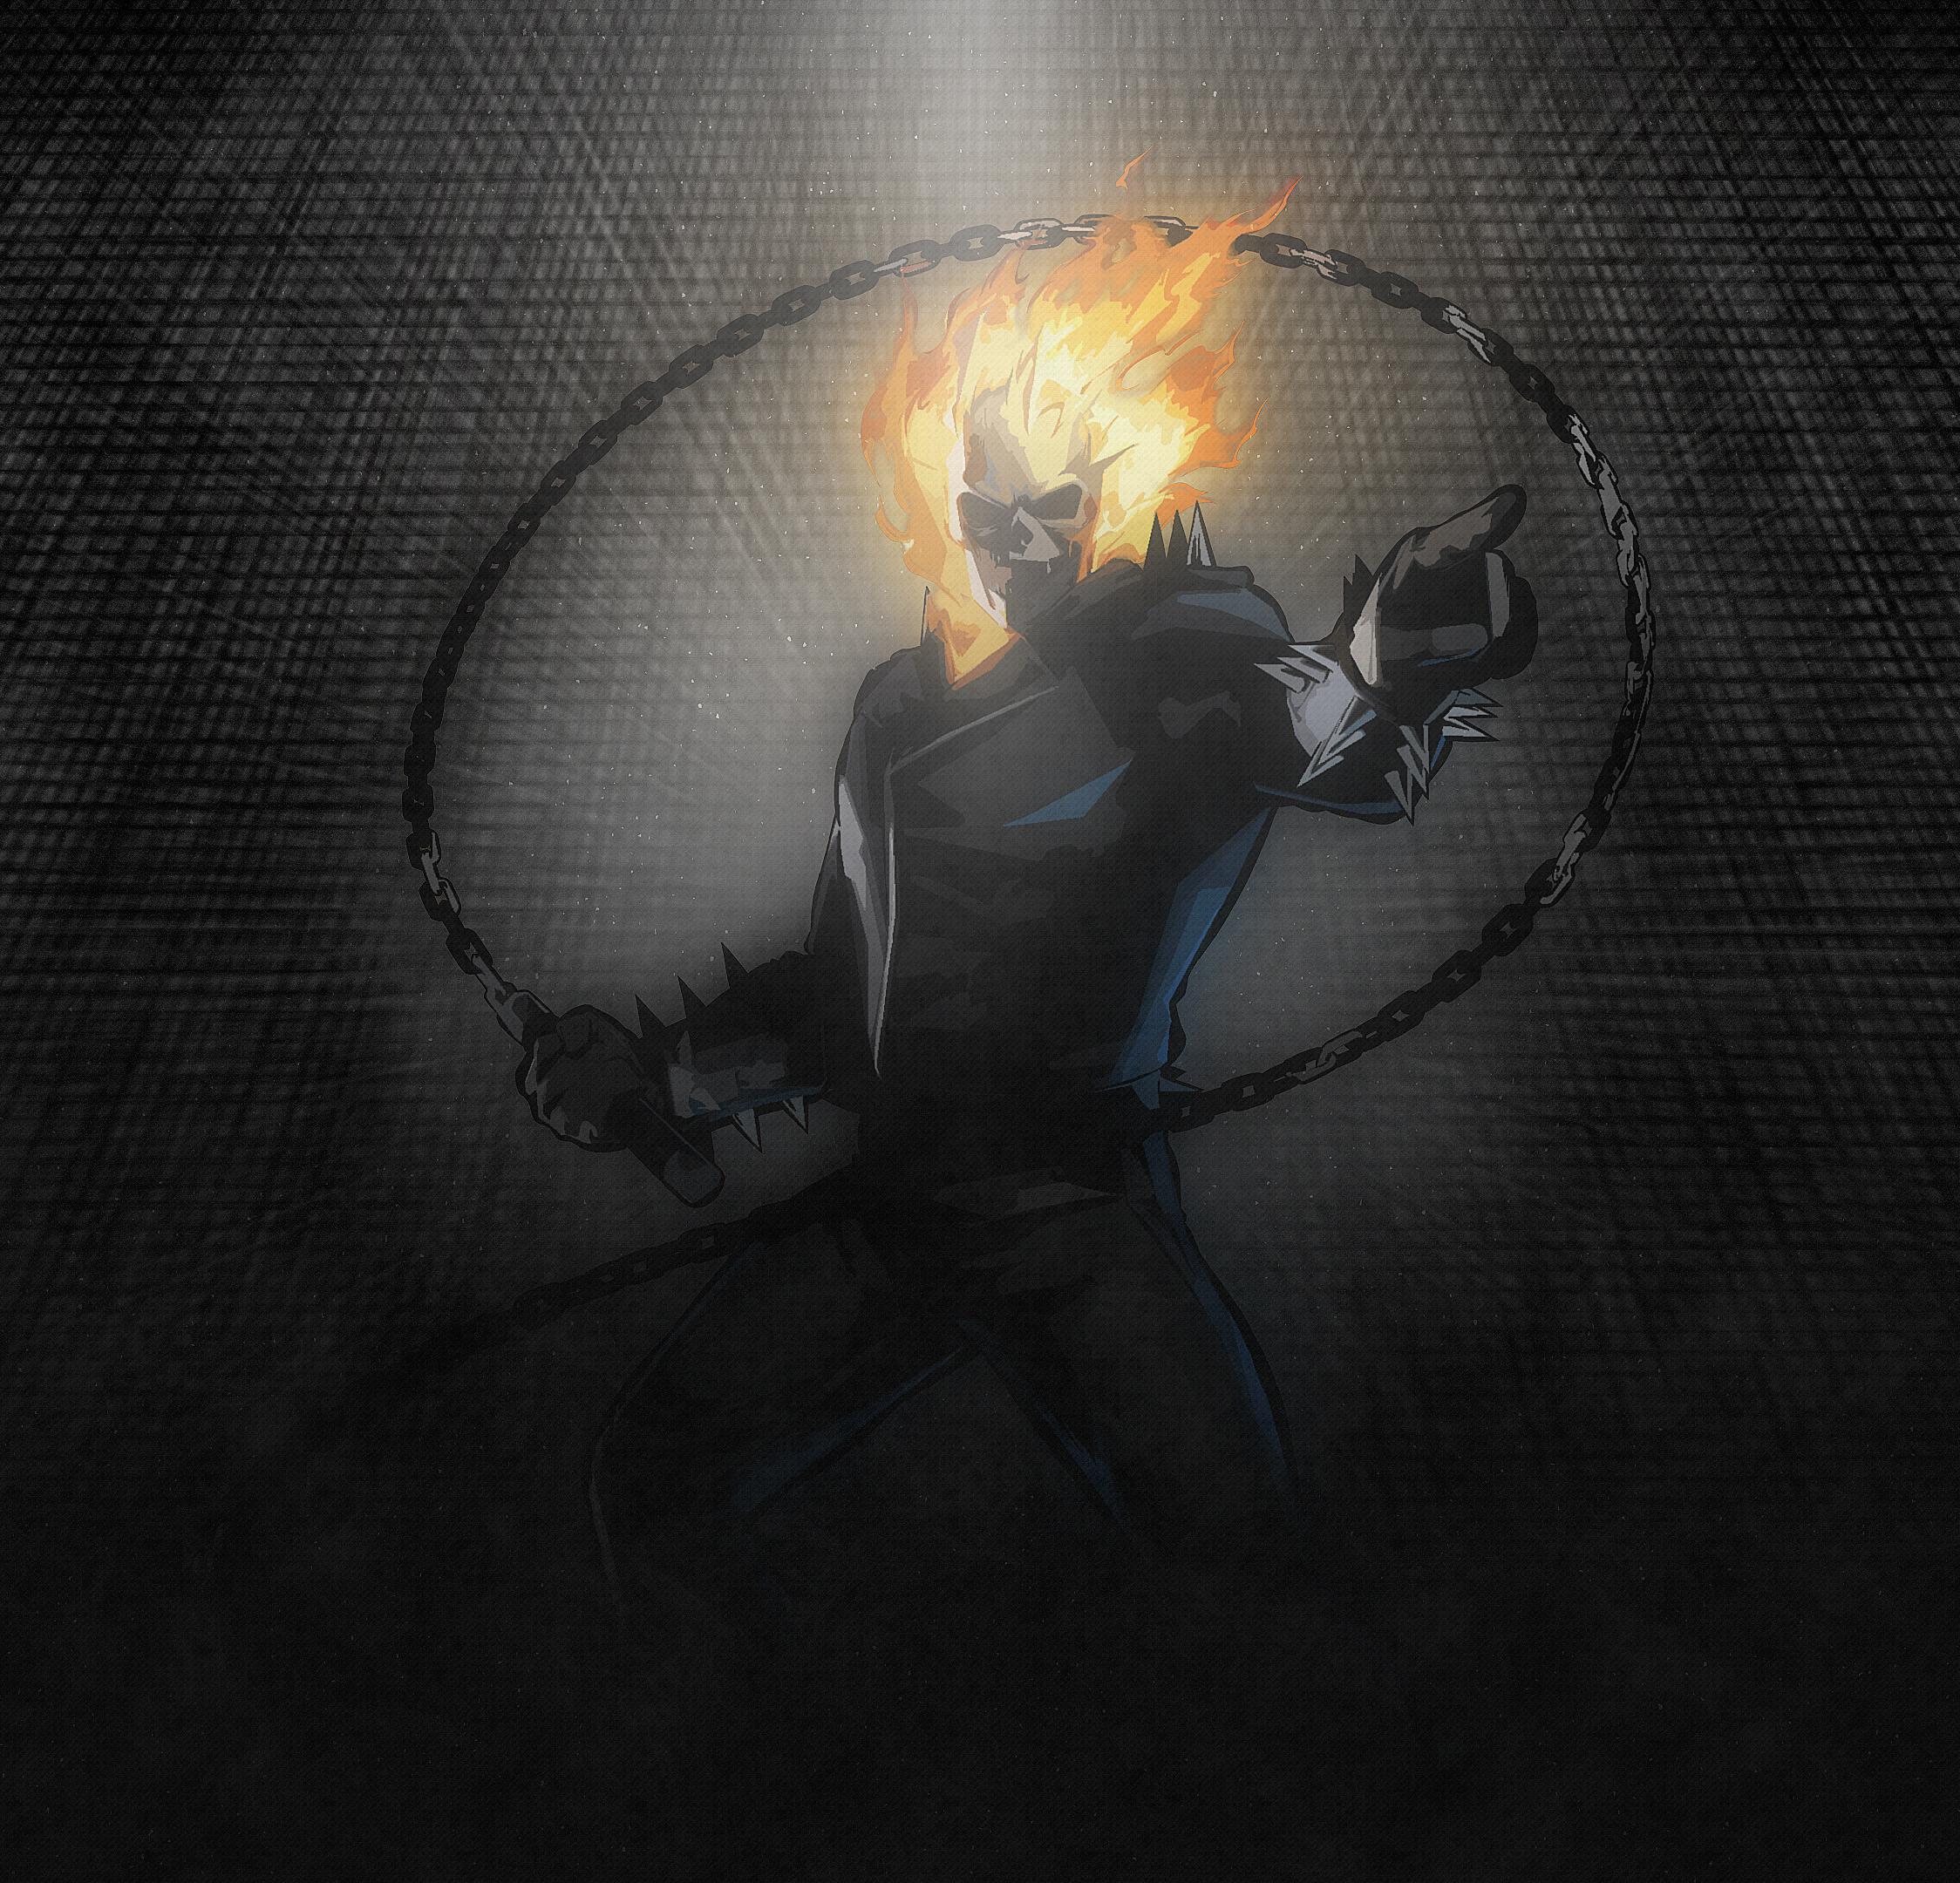 Popular Wallpaper Marvel Ipad Air - ghost-rider-artwork-4k  You Should Have_83641.jpg